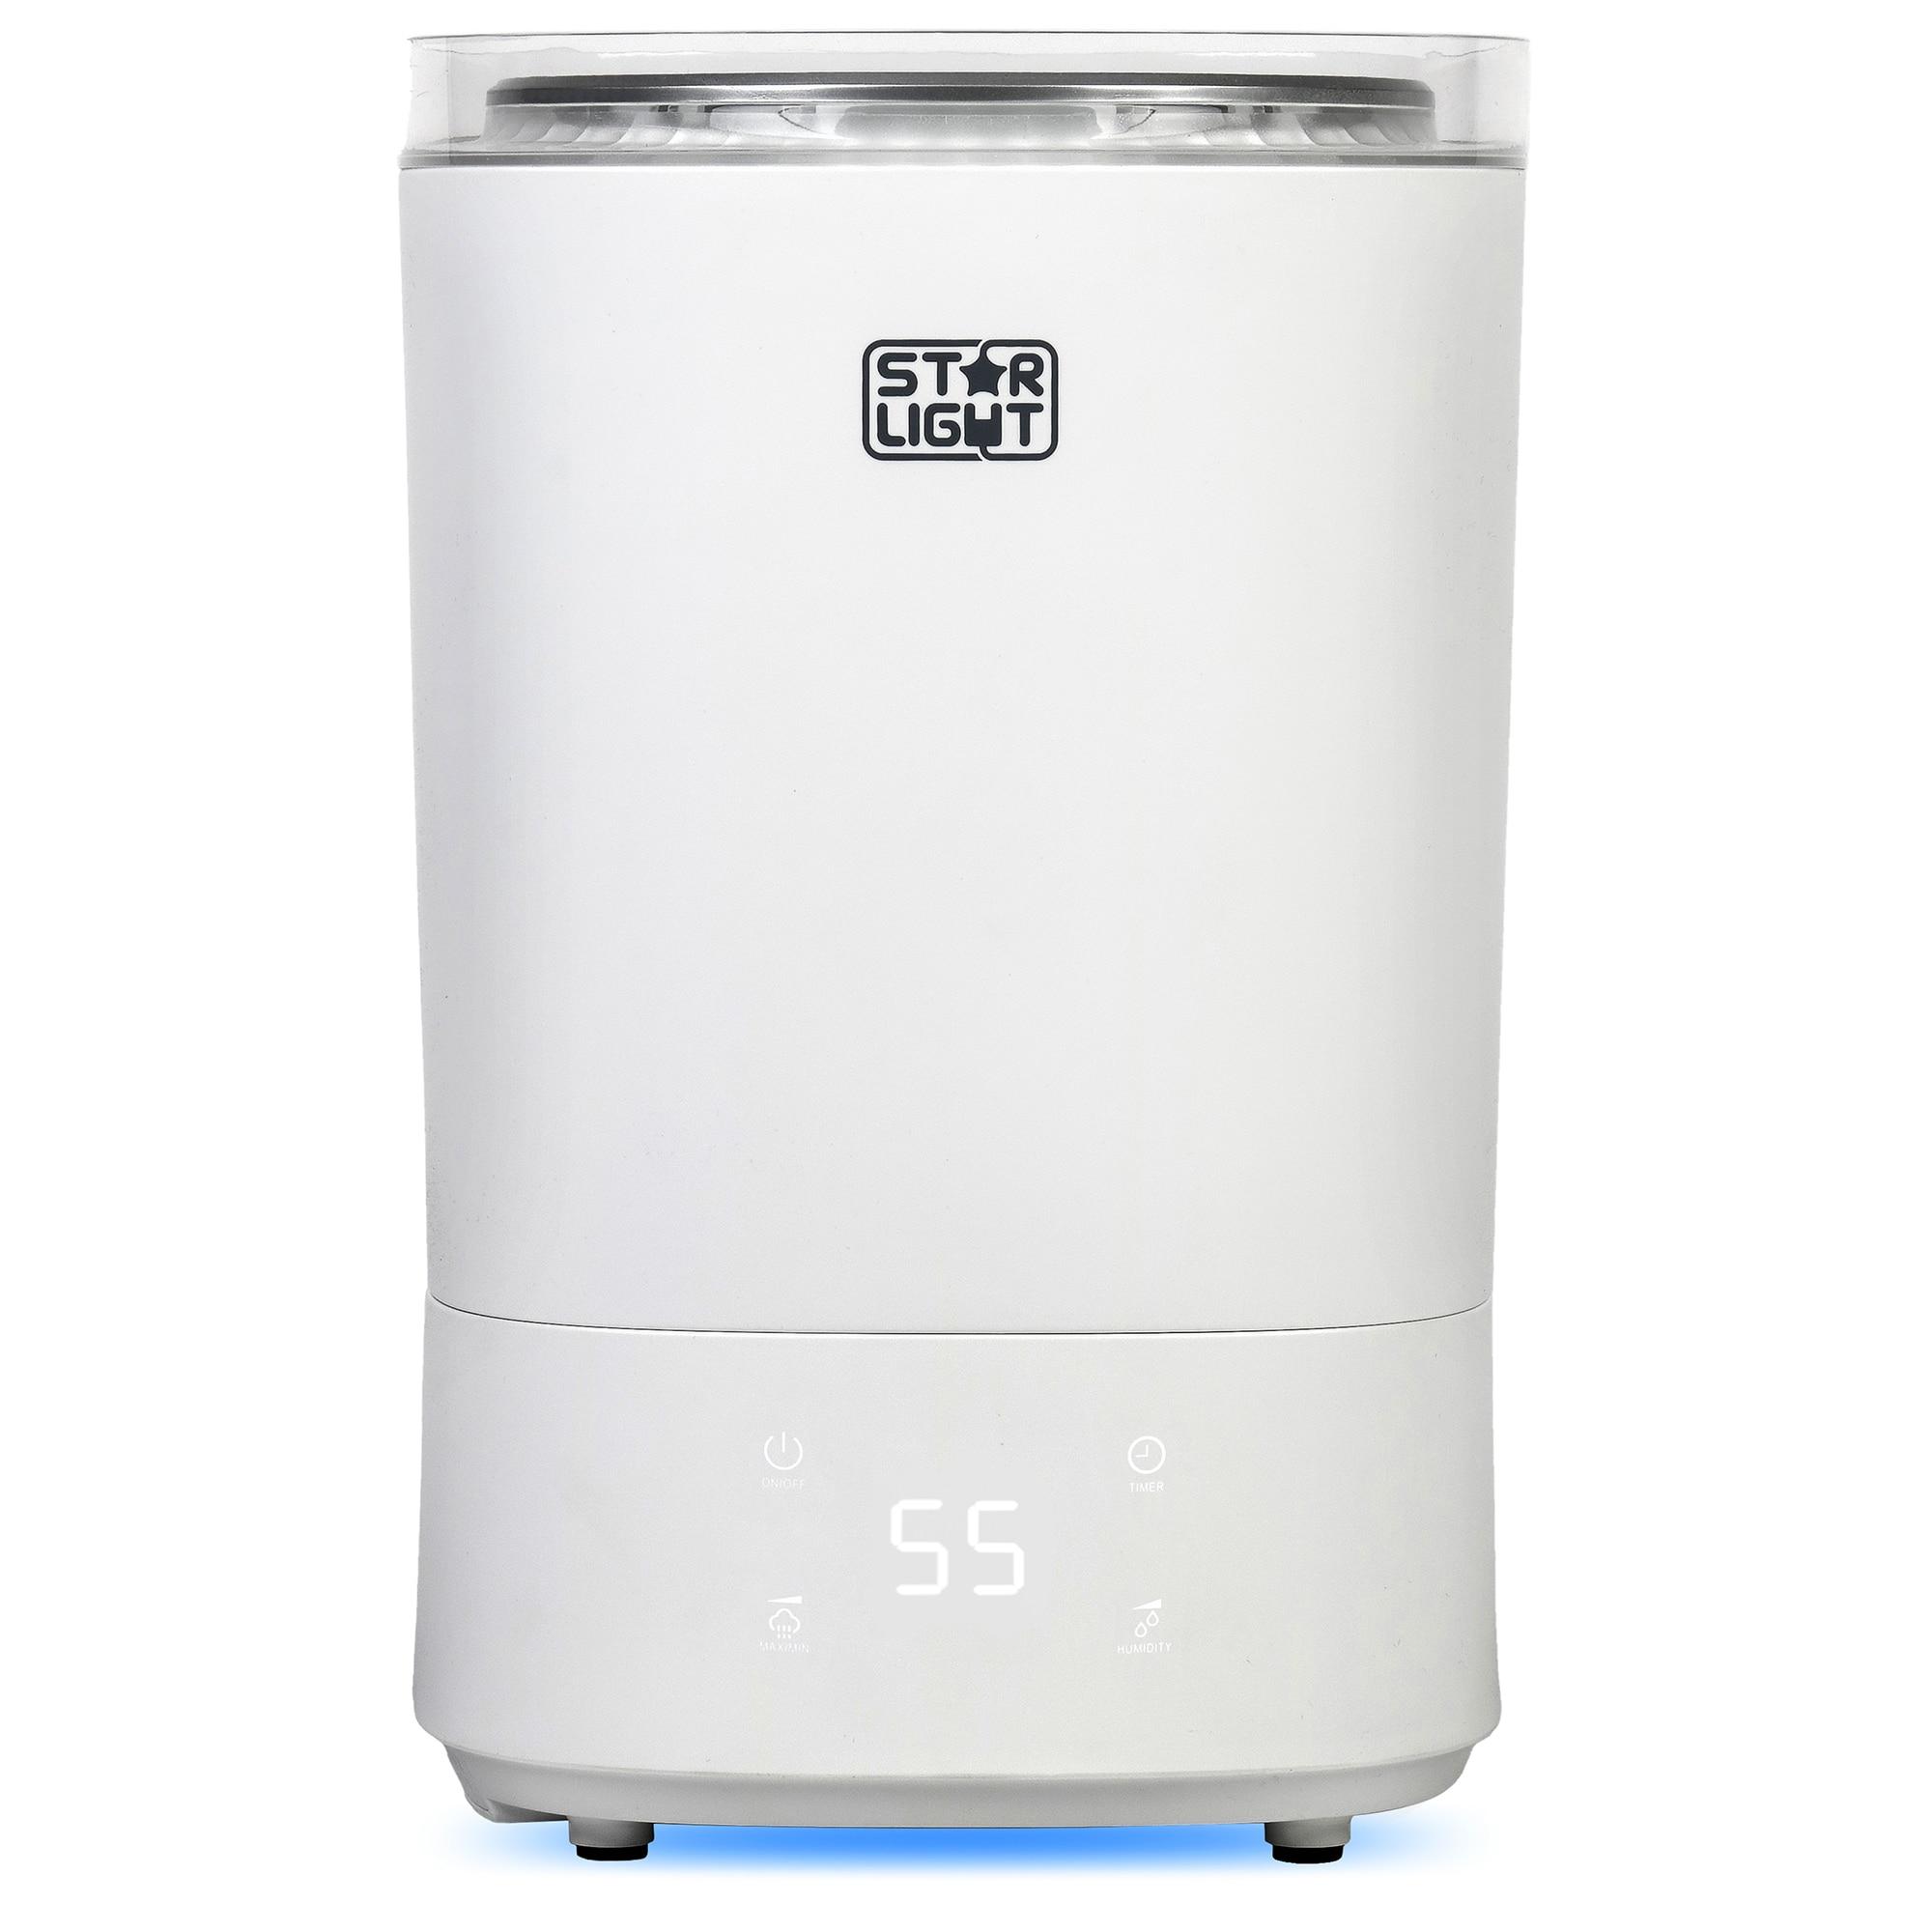 Fotografie Umidificator de aer Star-Light UCS-5530WH, rezervor 5.5l, Display LED, Timer, Control touch, Alb